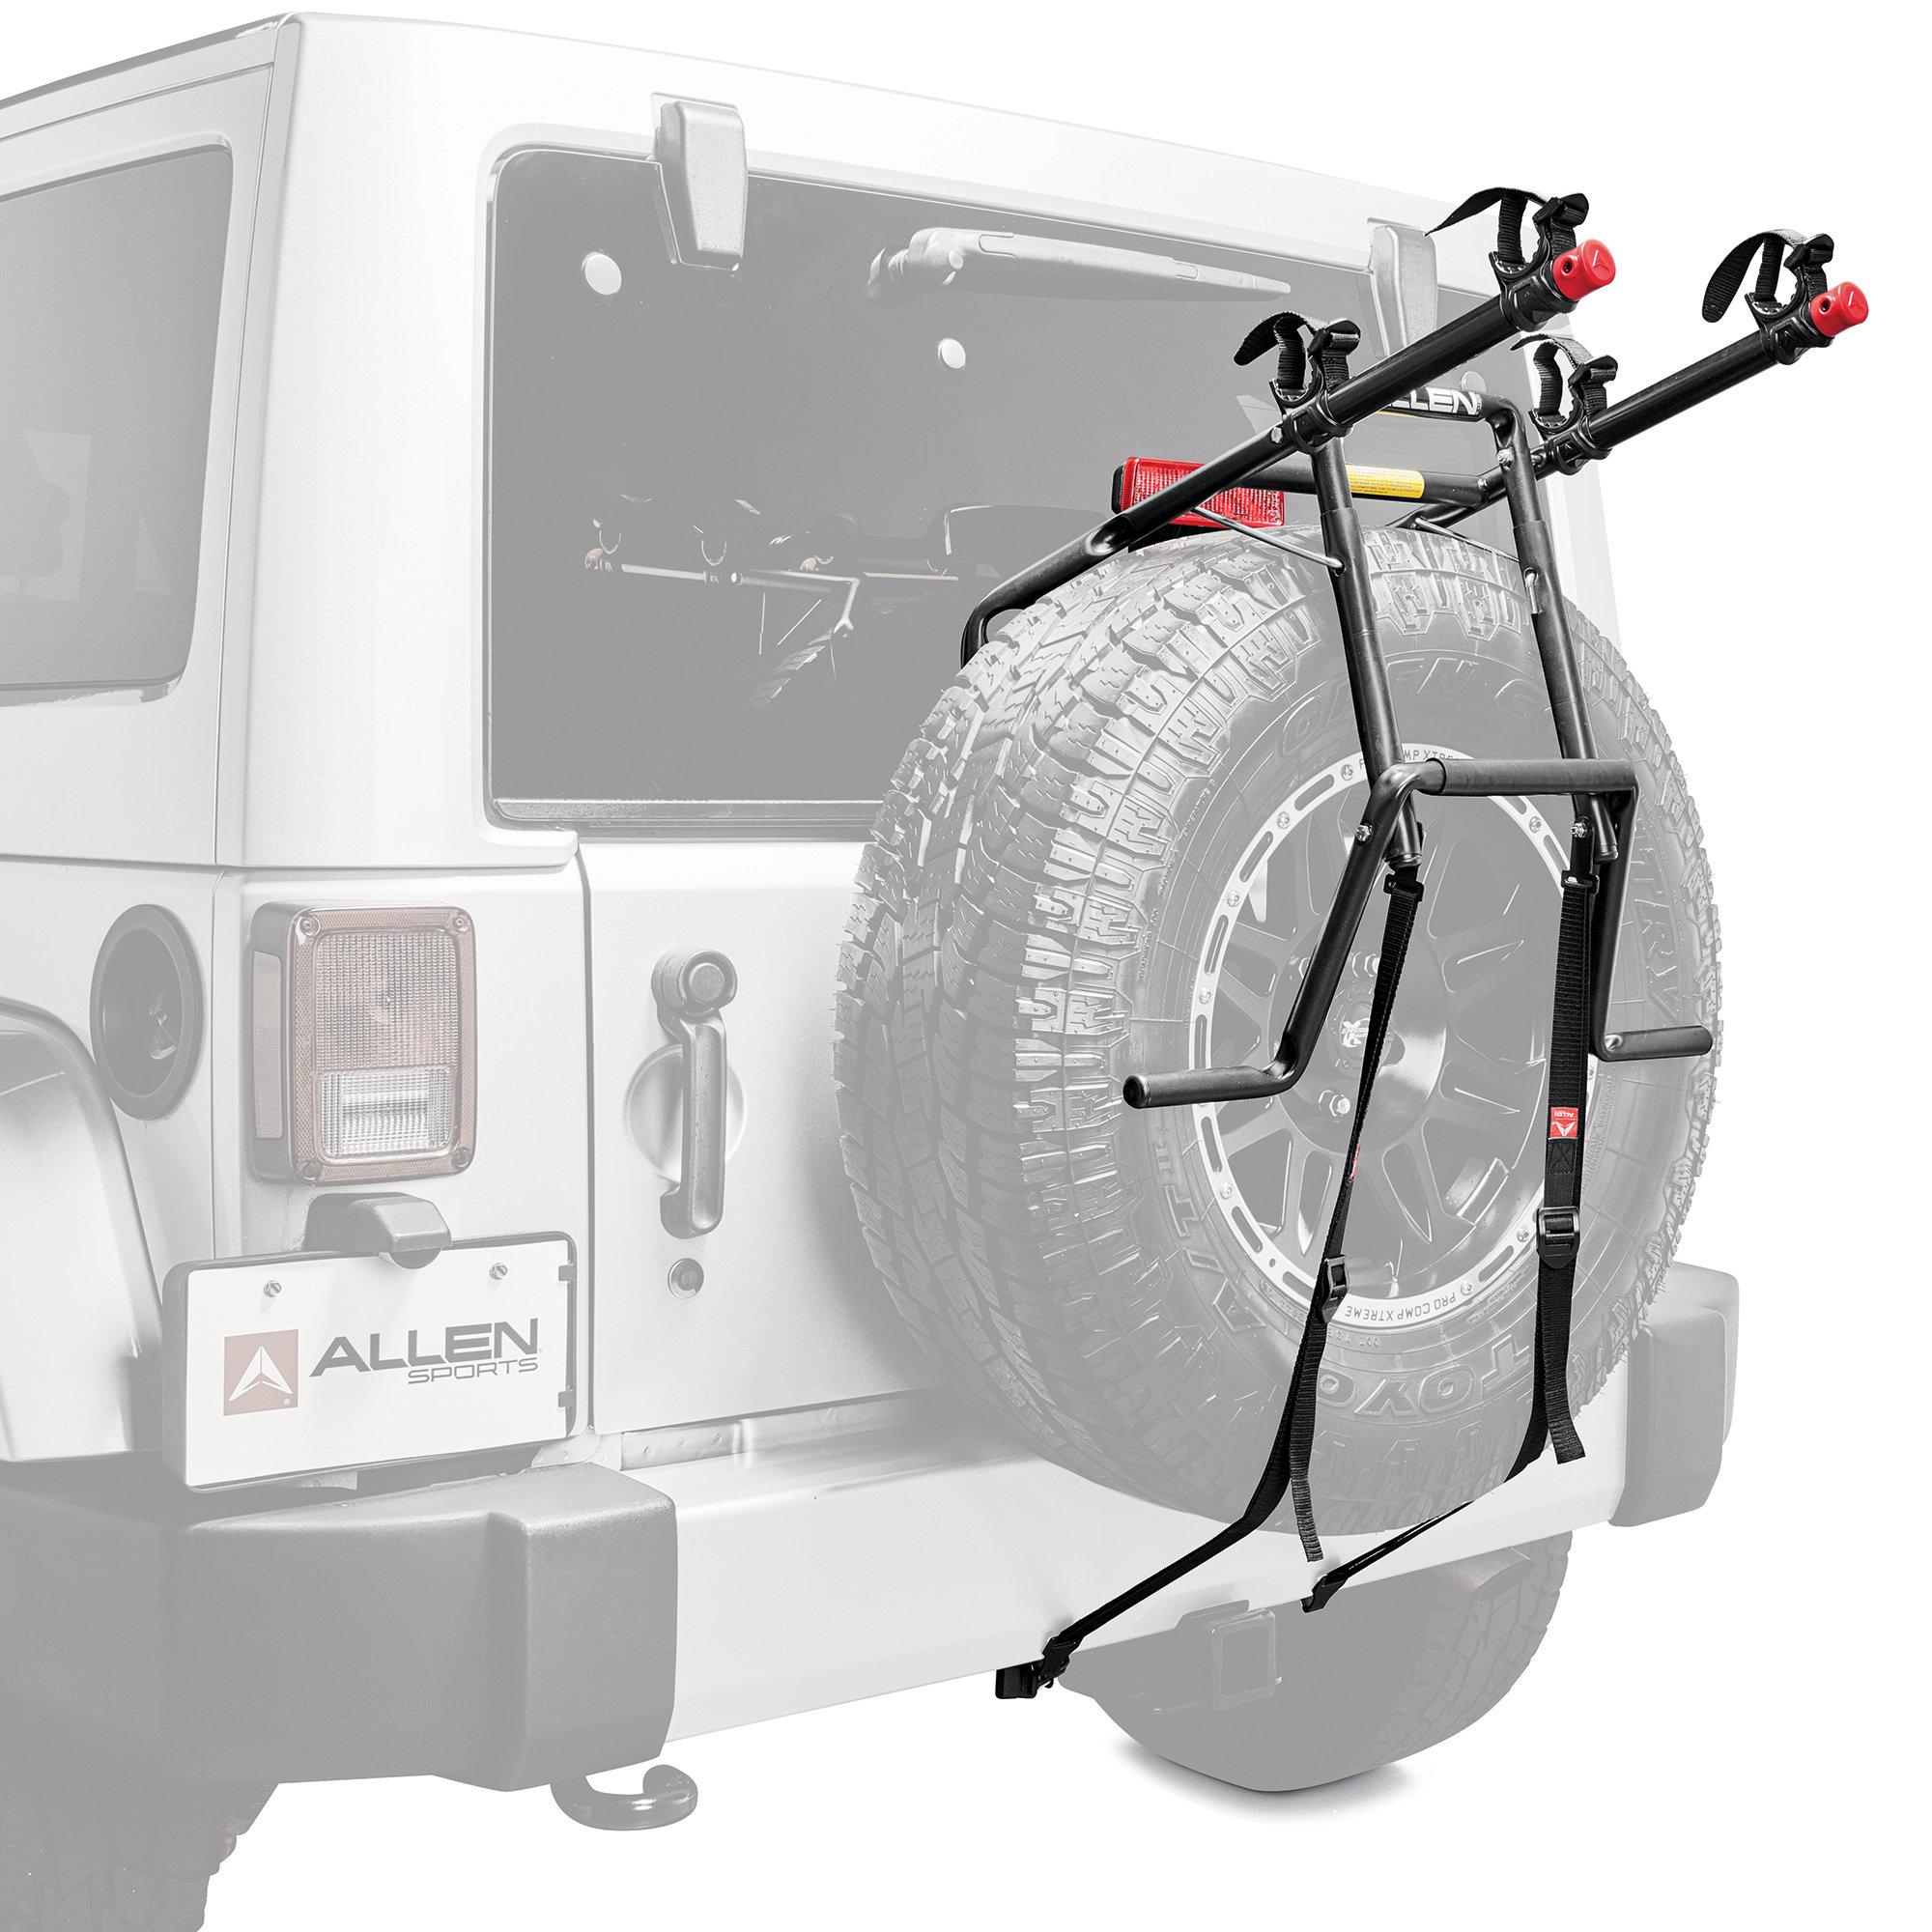 allen sports 322dn premium 2 bike spare tire mounted bike rack for 18 20 jeep wrangler jl